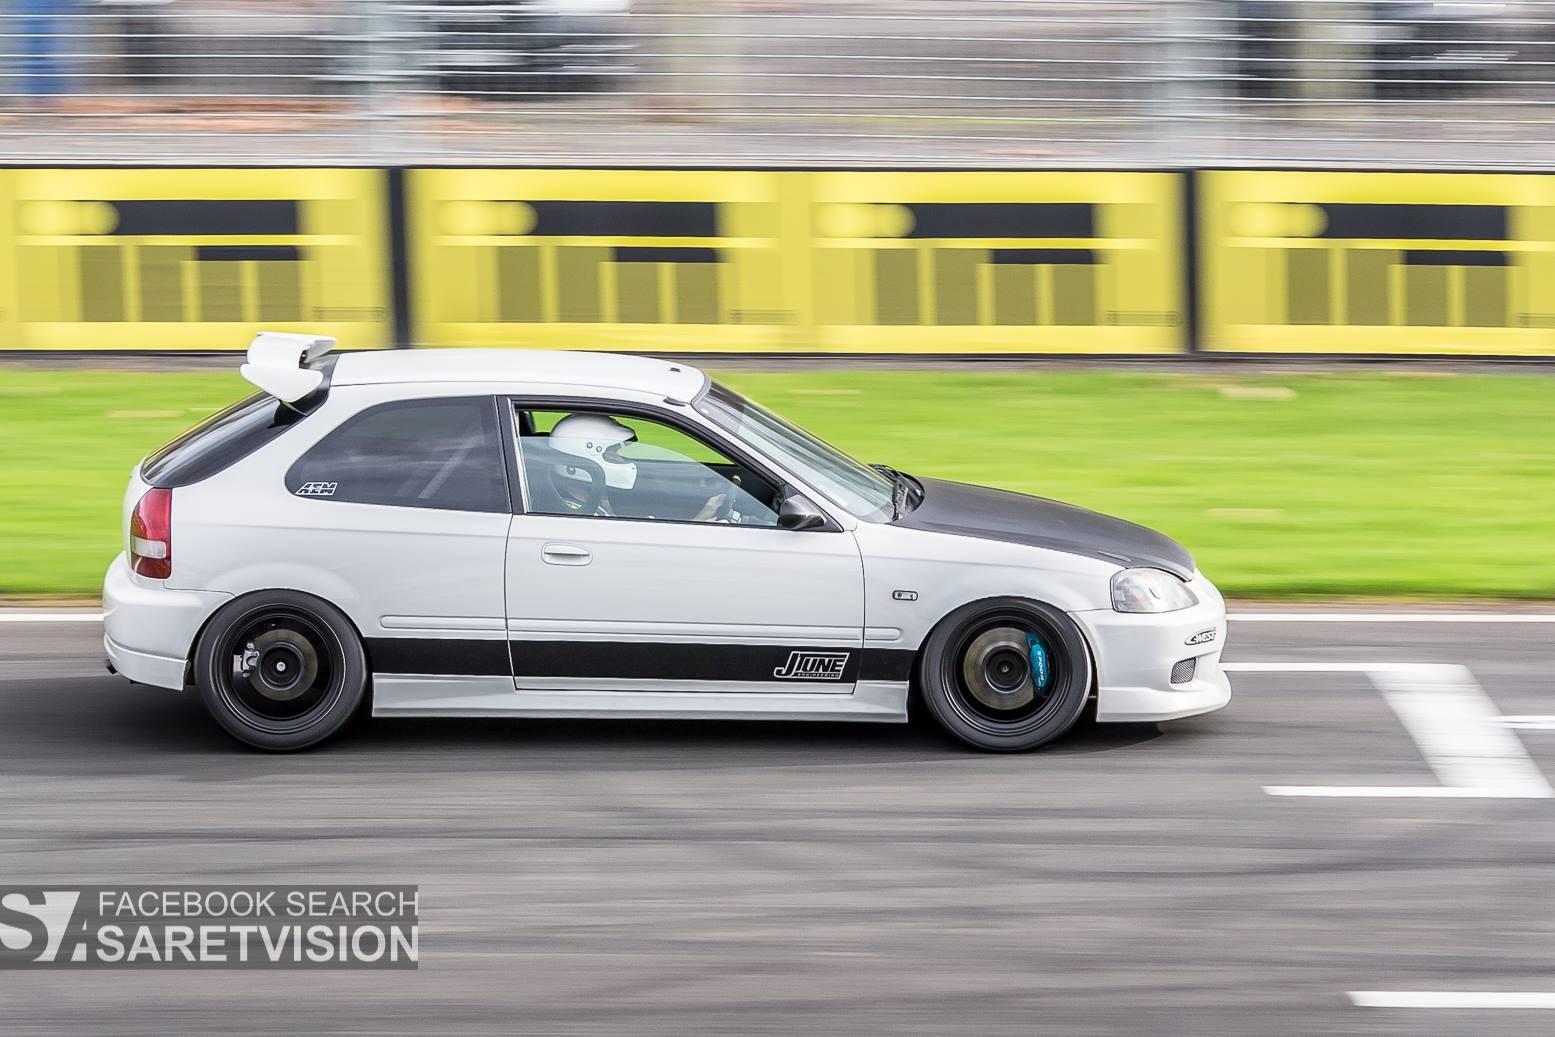 Race Cars Car Vehicle Honda Honda Civic Sports Car Racing Sedan Wheel  Motorsport Land Vehicle Race